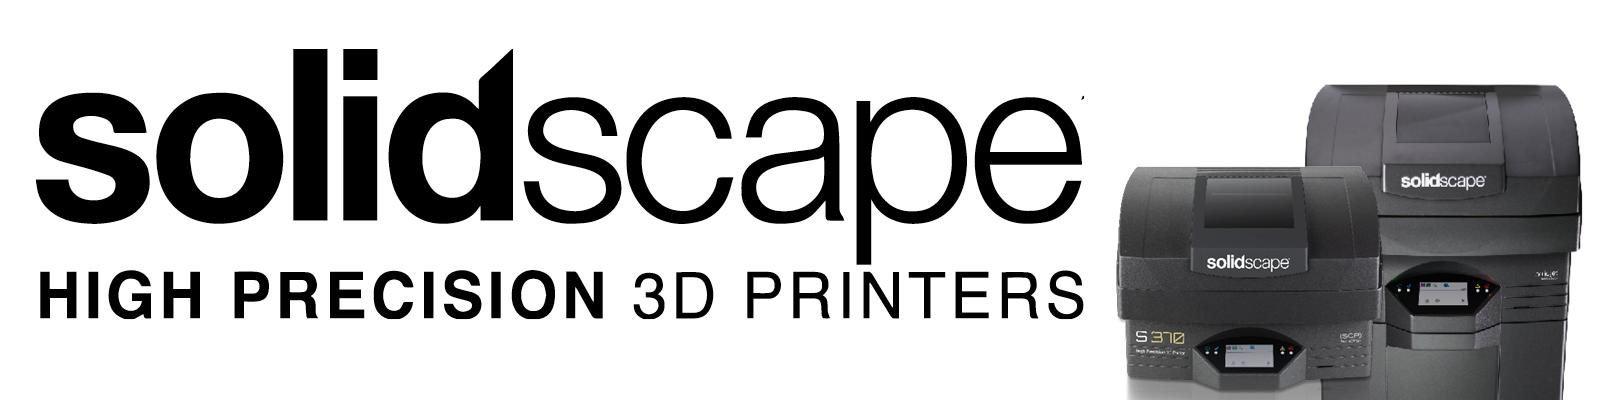 Solidscape 3D Printers